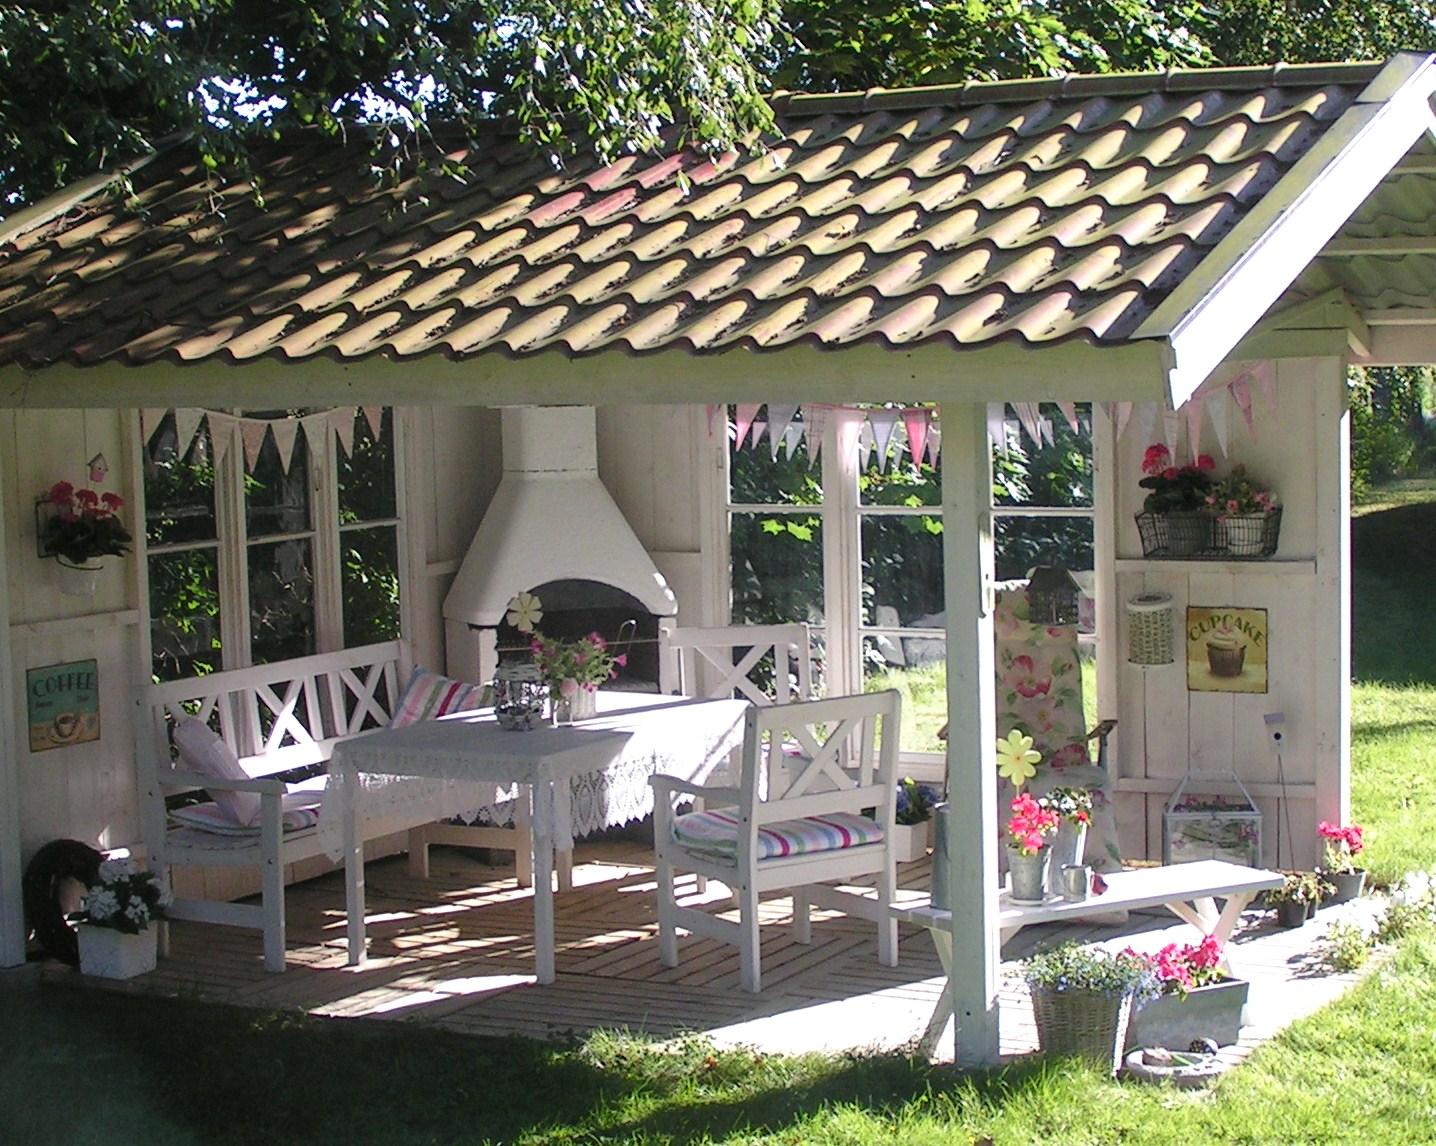 Outdoorküche Bausatz Erfahrung : Outdoor küche bausatz ikea küchen körbe wandtattoo küche kaufen alu